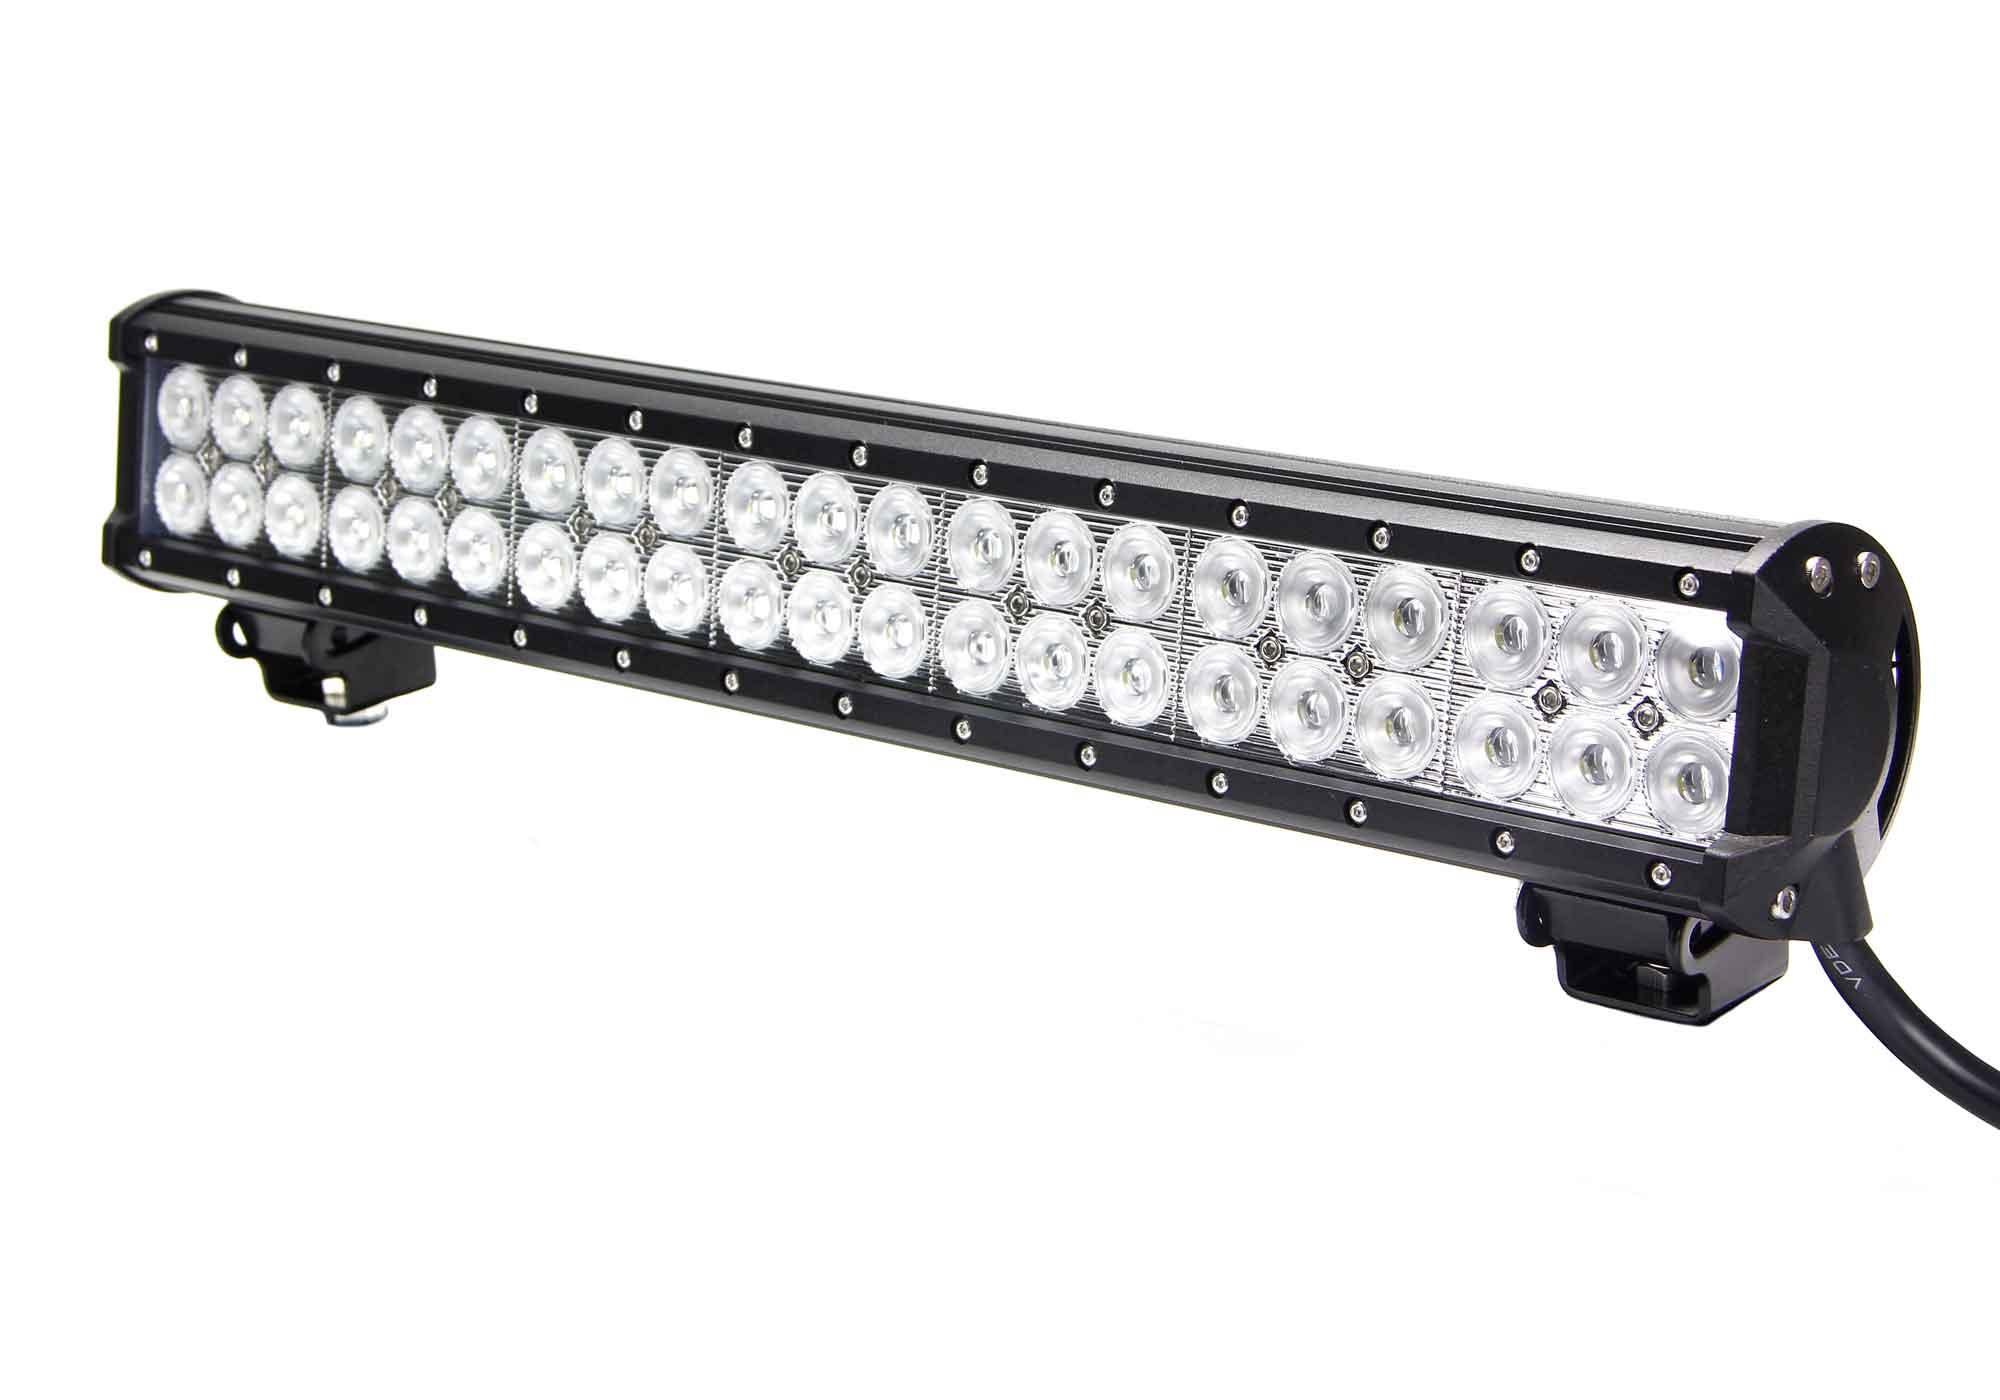 Vortex Series Led Light Bar 20 Inch 126 Watt Combo